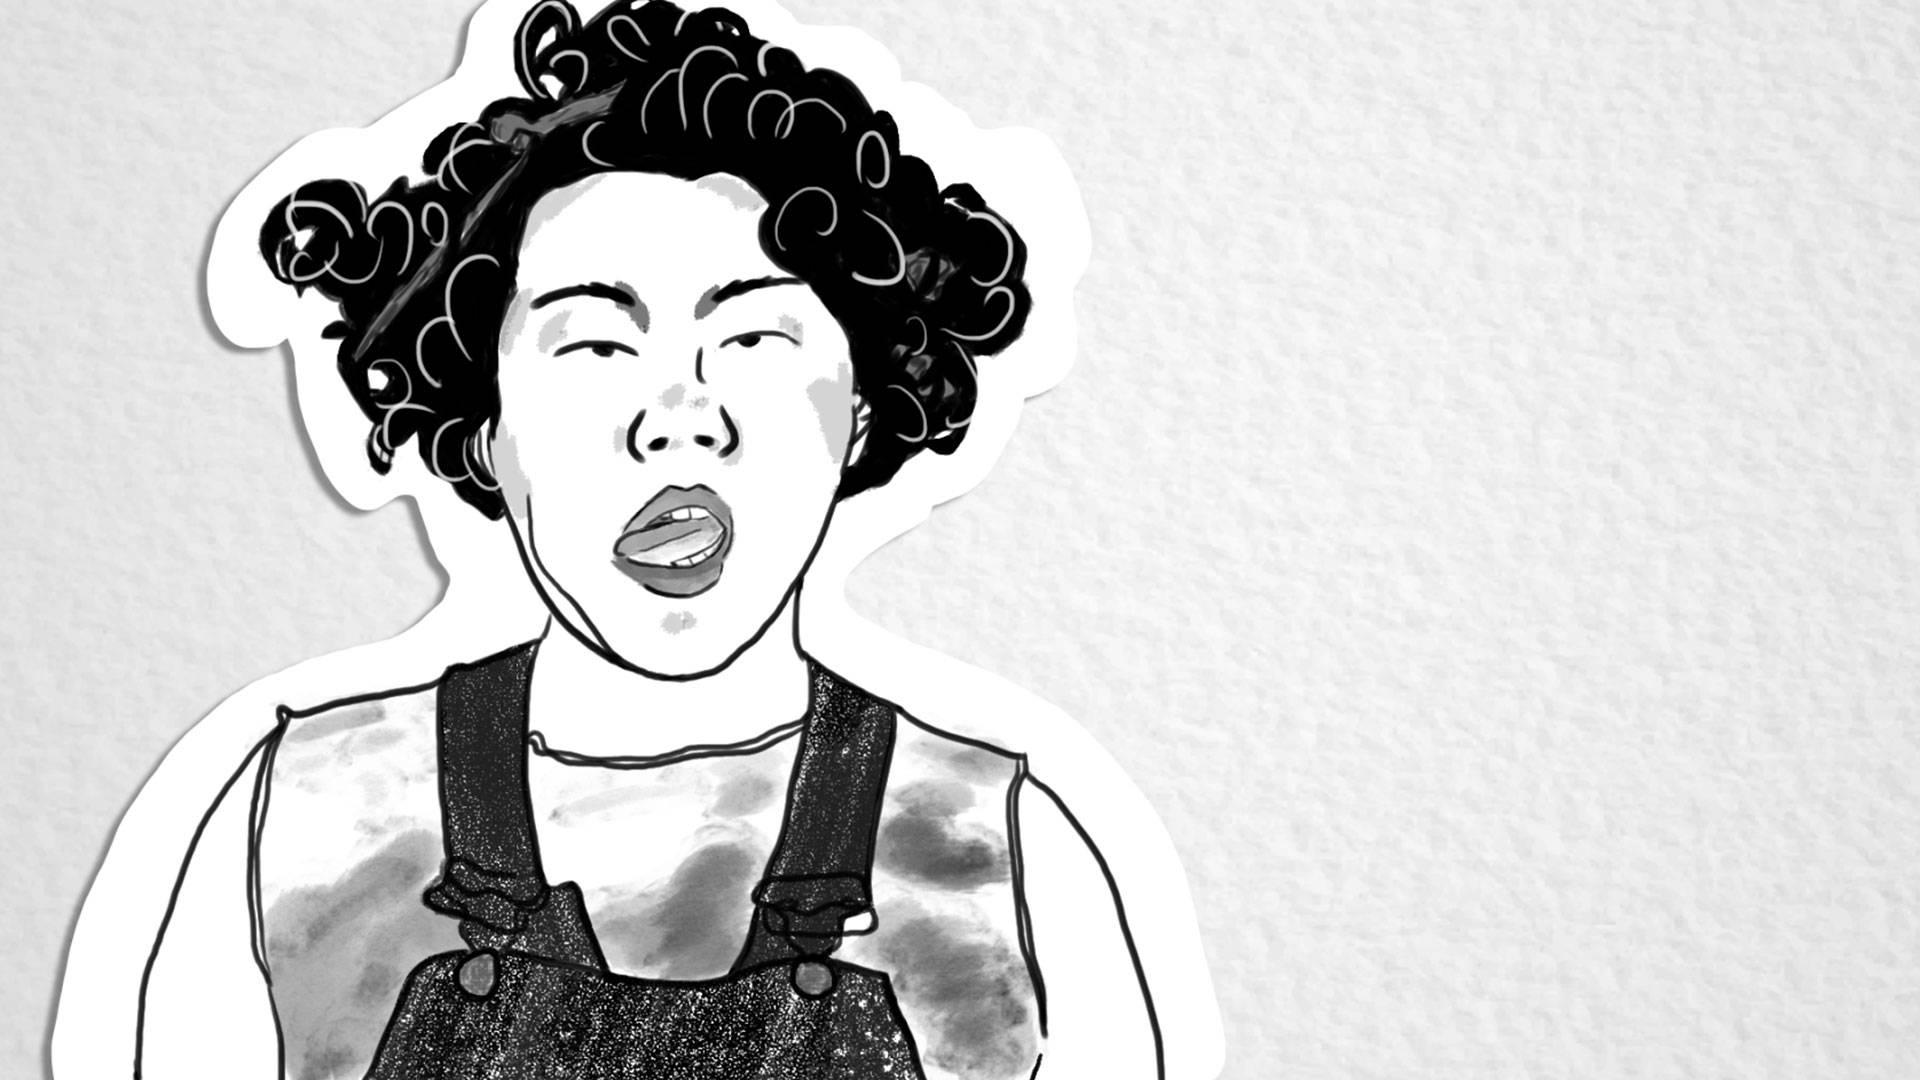 Ara Jo. Illustration by Melanie Ruiz/KQED